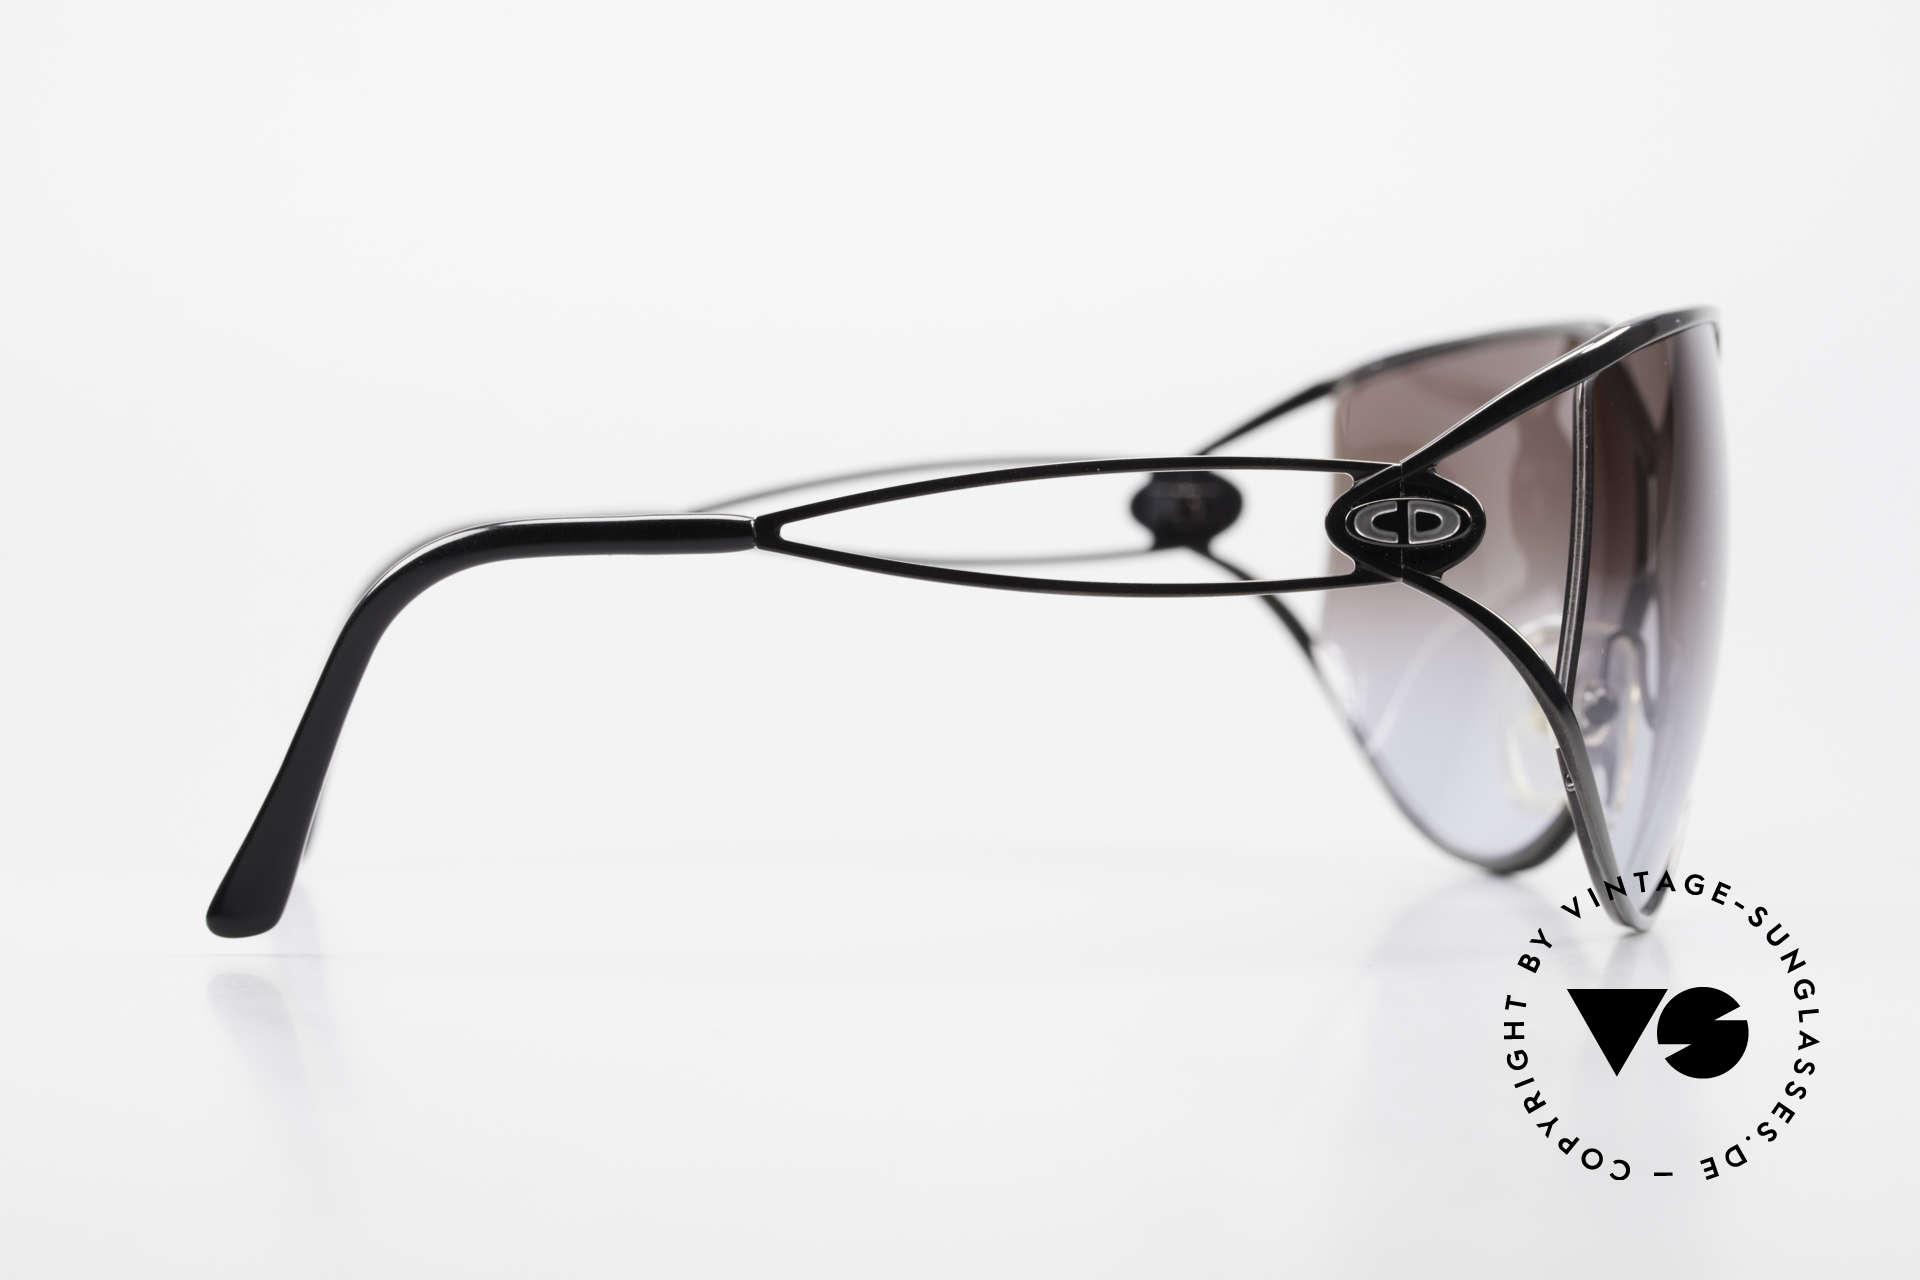 Christian Dior 2345 Ladies Designer Sunglasses 90s, gray-gradient sun lenses (100% UV protection), Made for Women